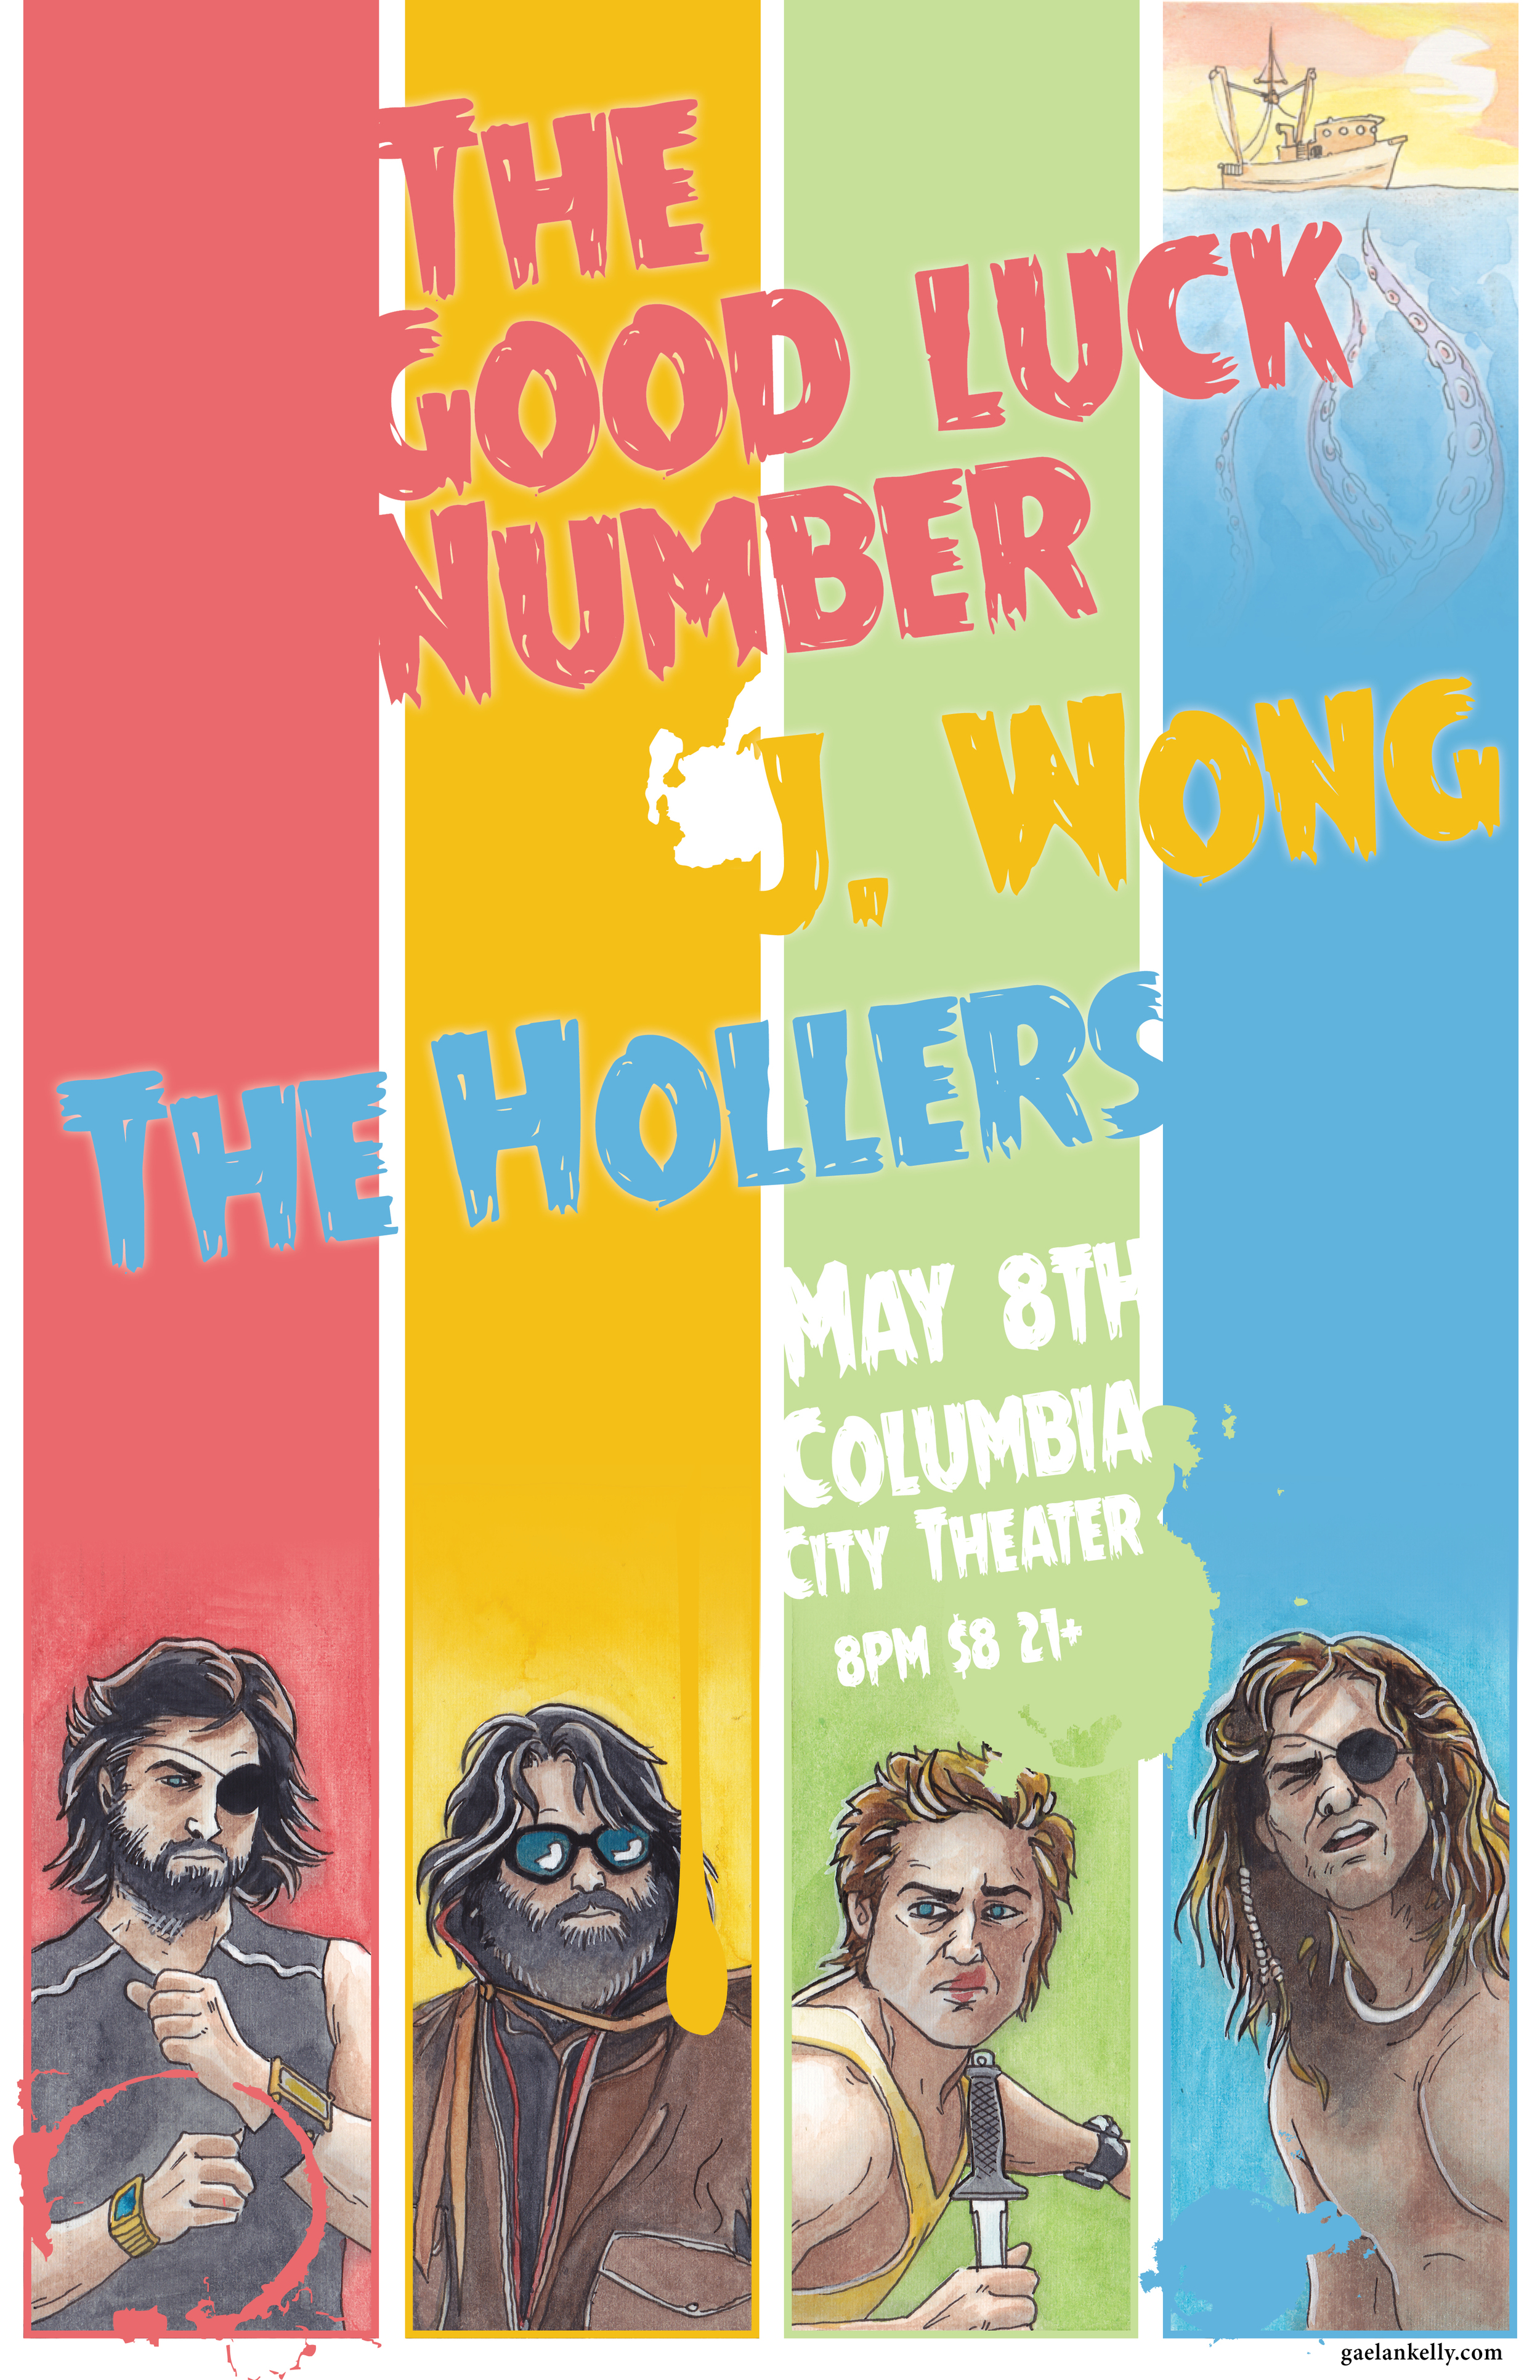 Good Luck Number show poster.jpg